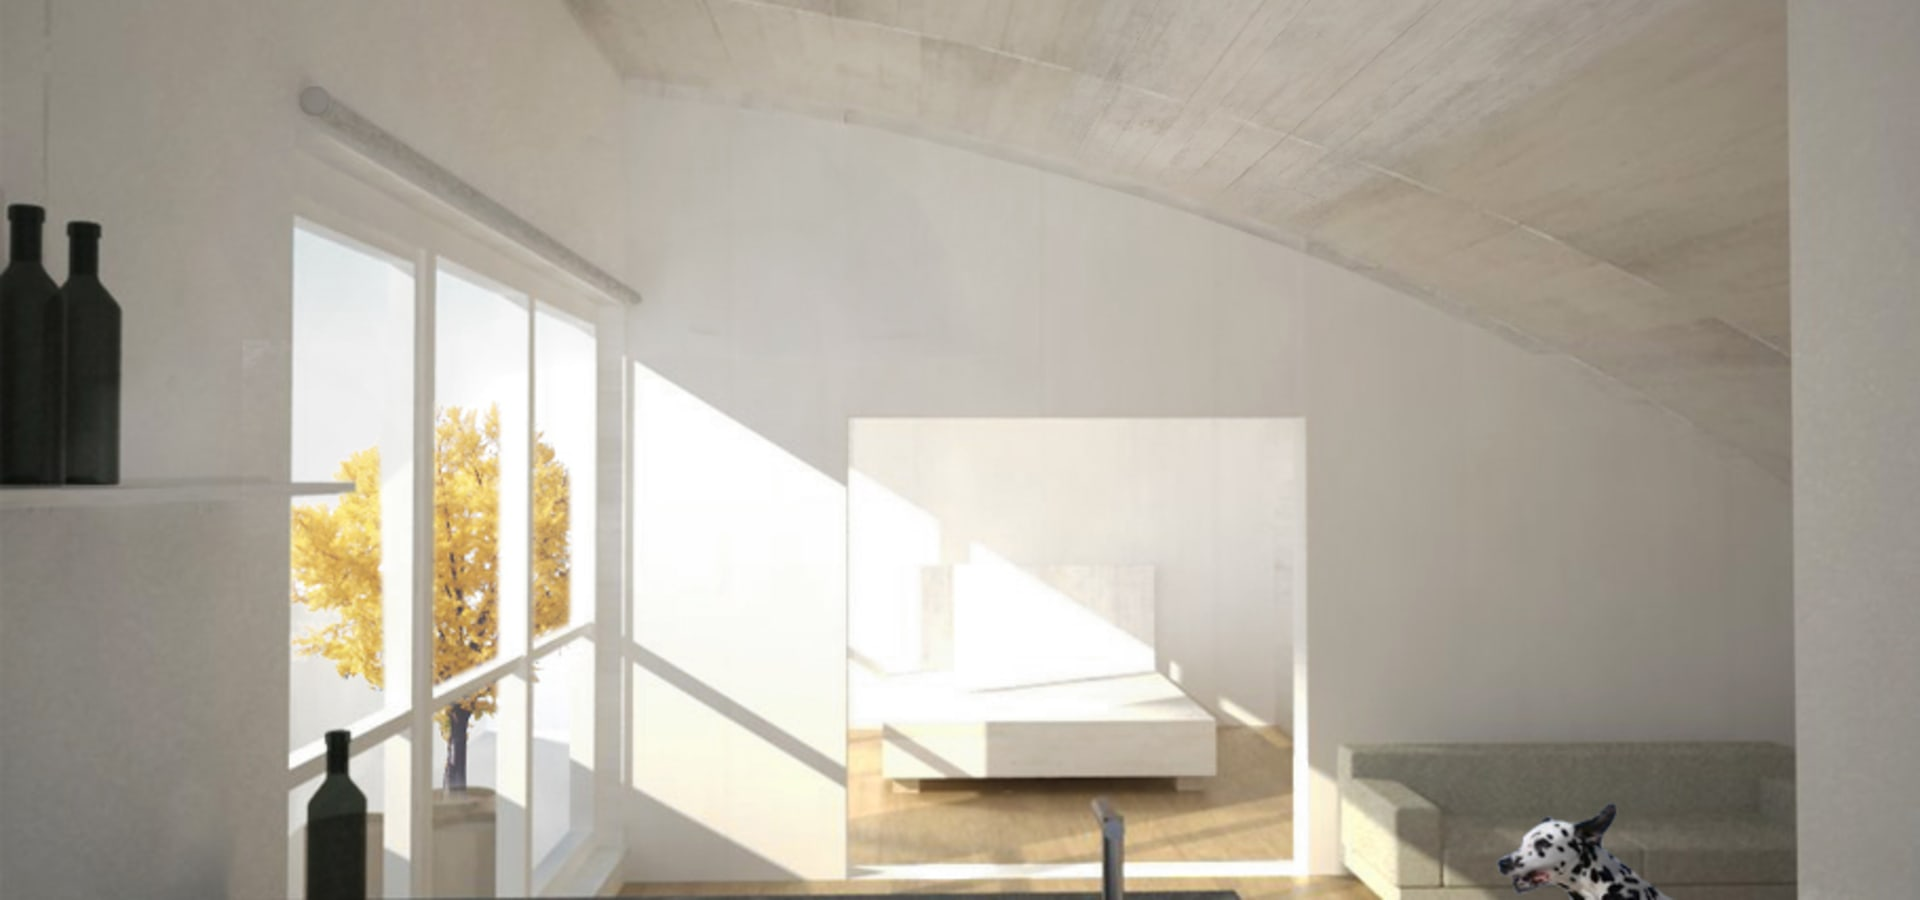 Brut Deluxe Architecture + Design